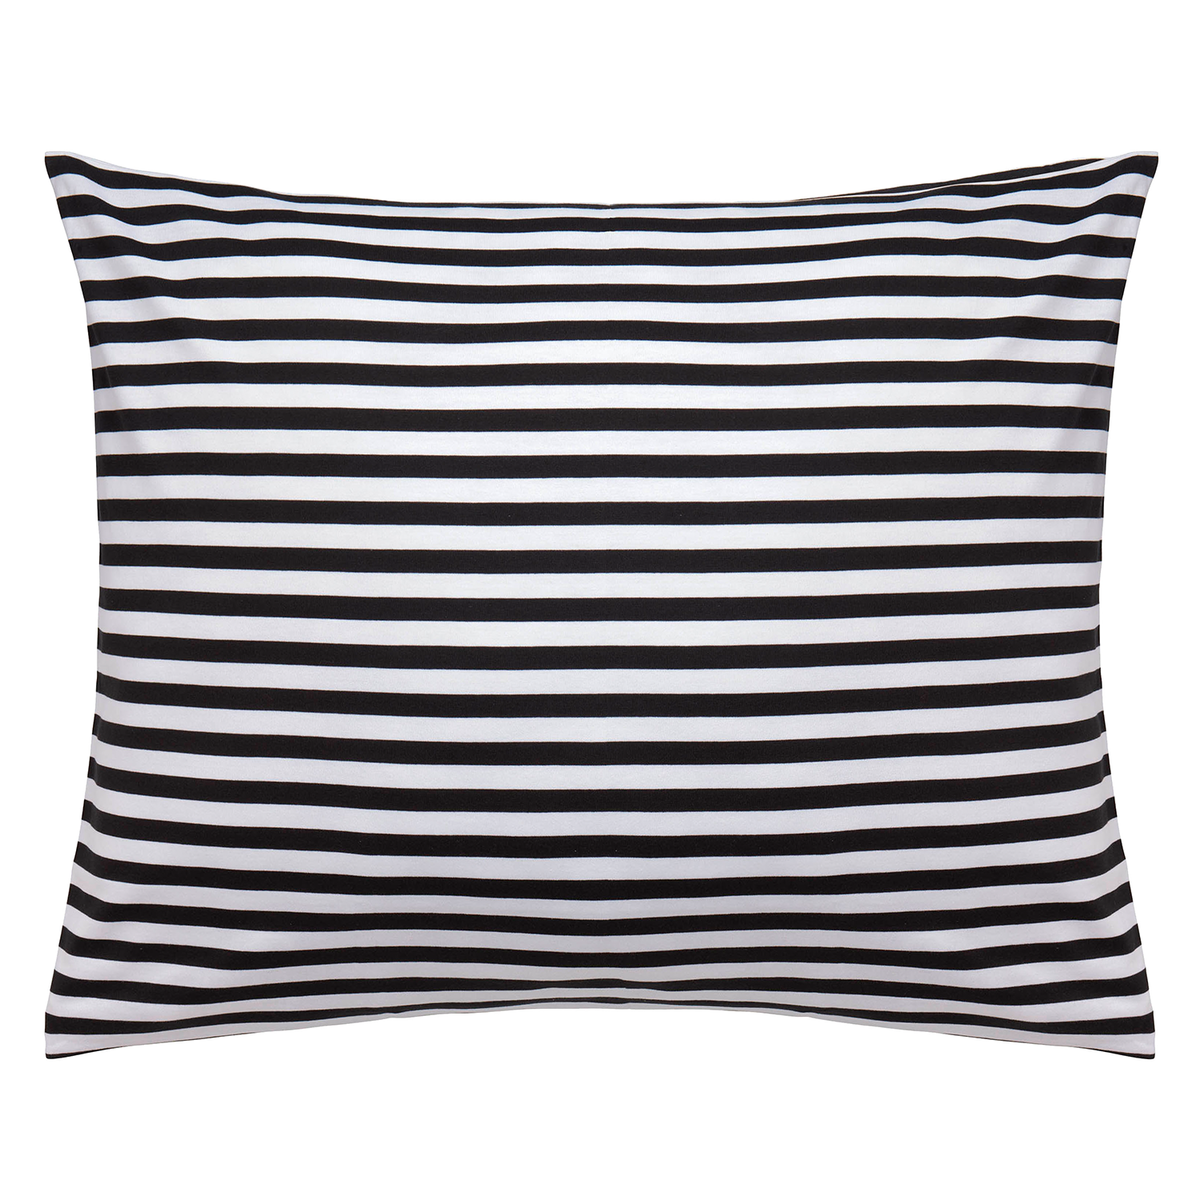 Marimekko Tasaraita Pillowcase, Black - White